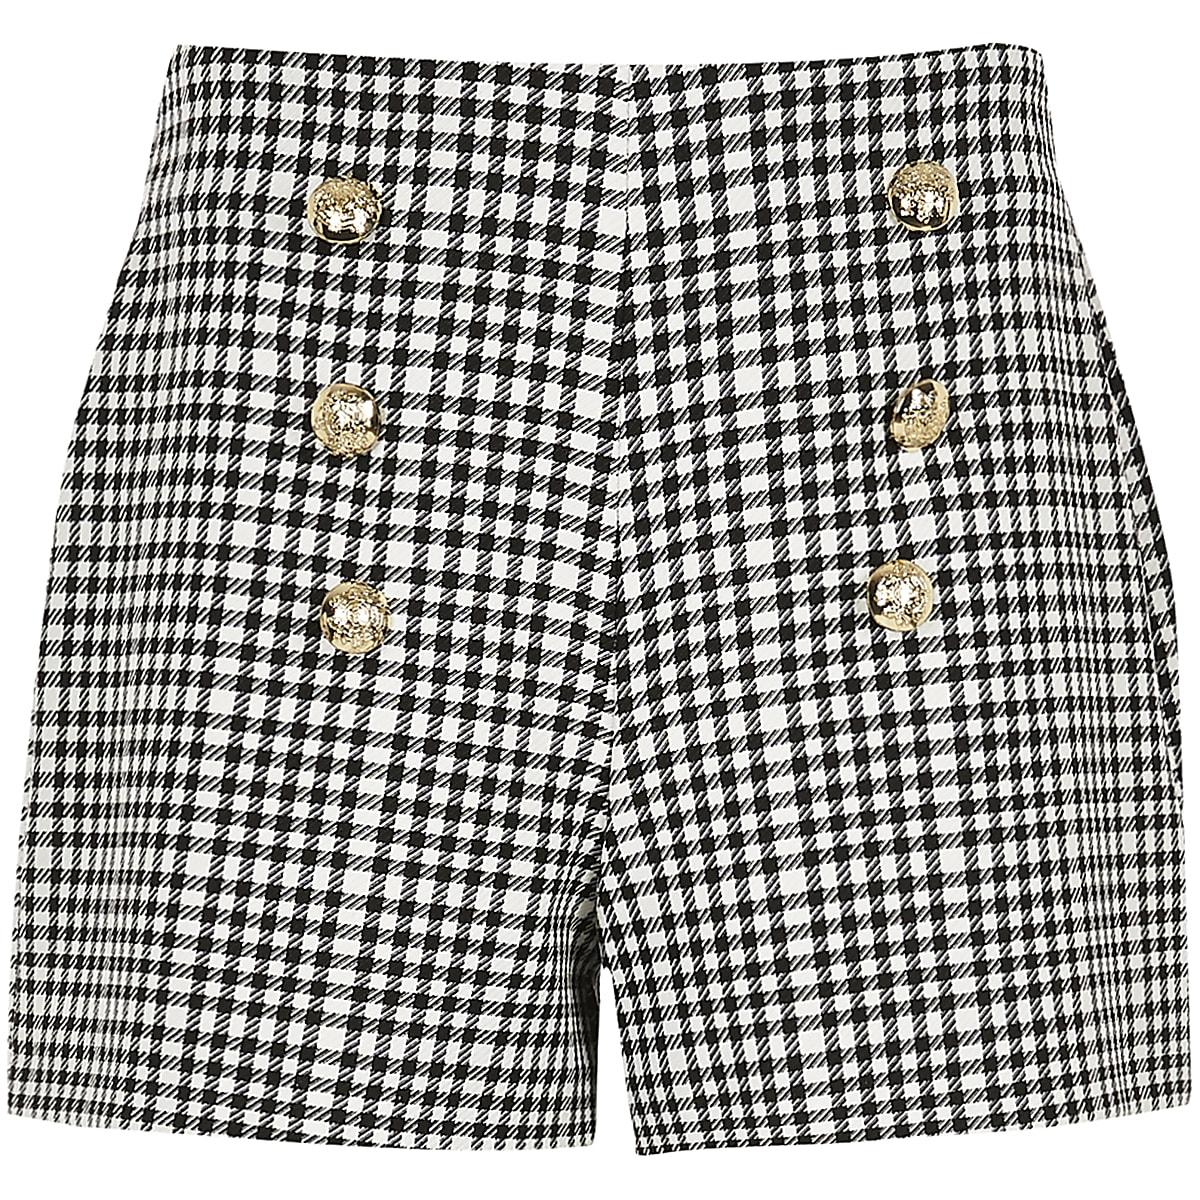 Girls monochrome gingham military shorts